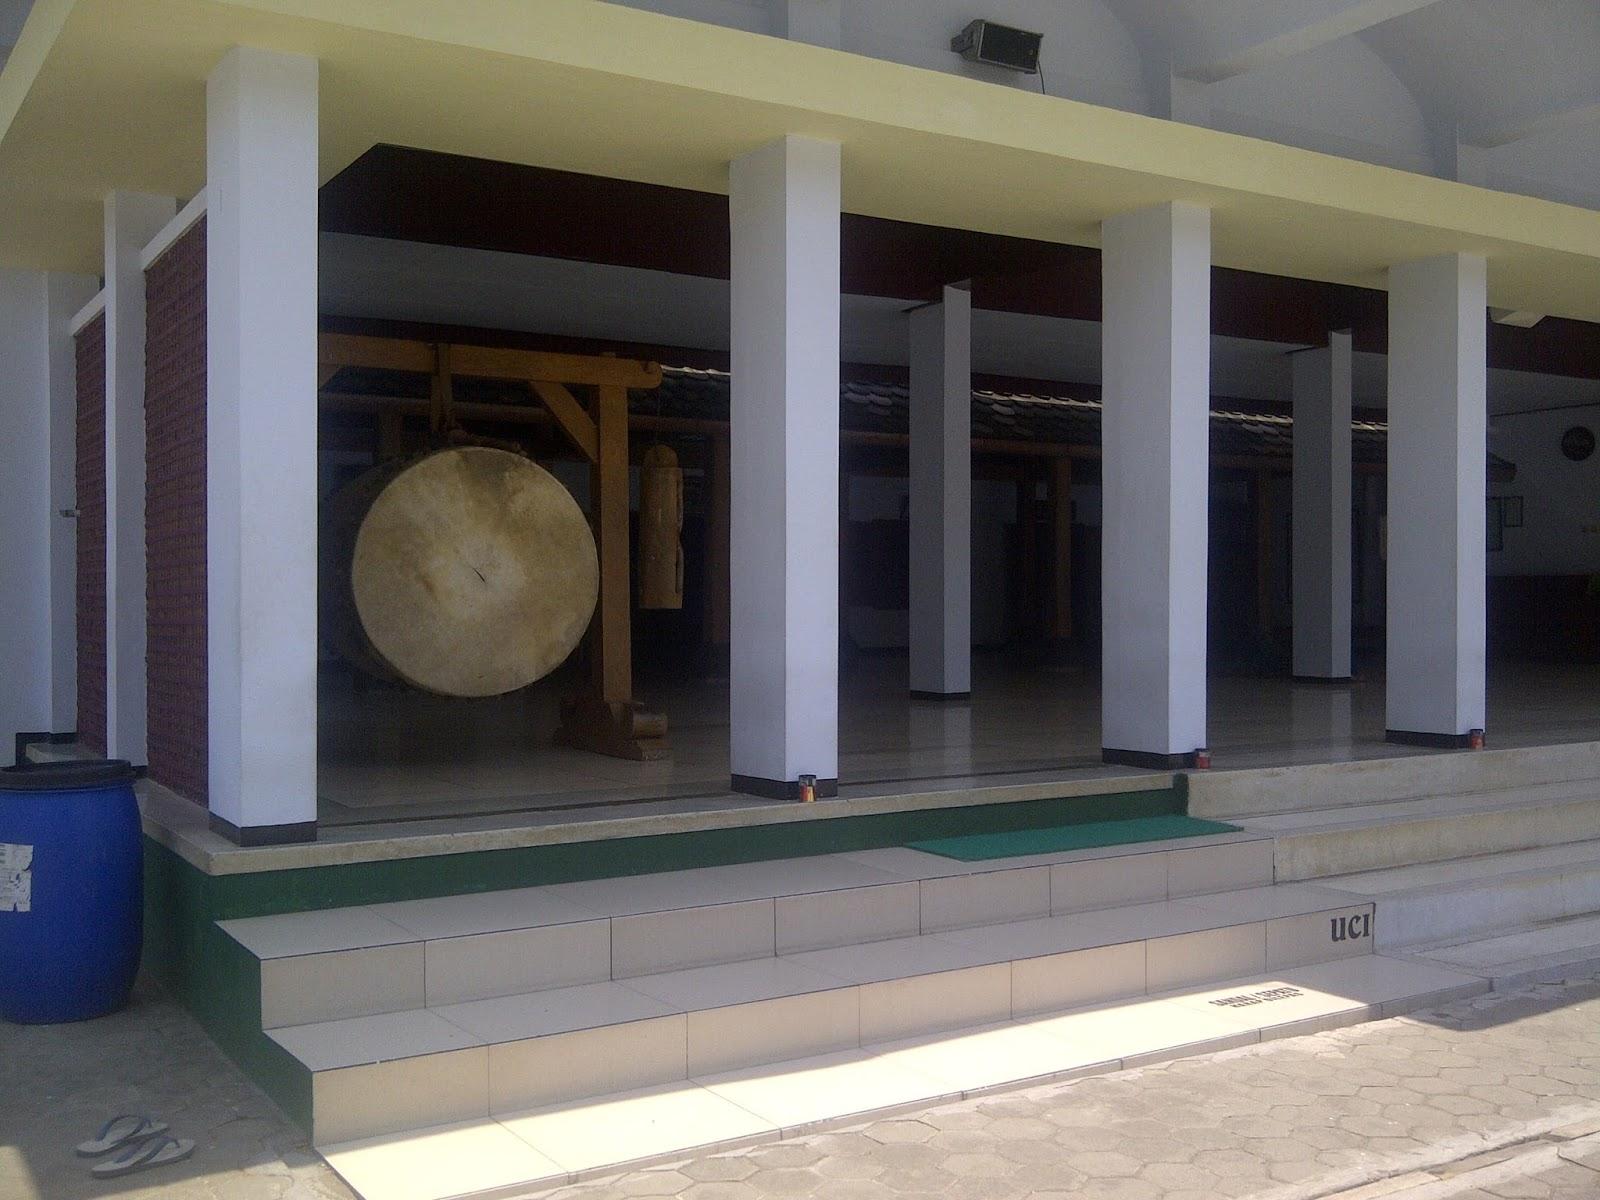 Masjid Tegalsari Wisata Religi Ponorogo Ayo Nge Trip Iya Gaes